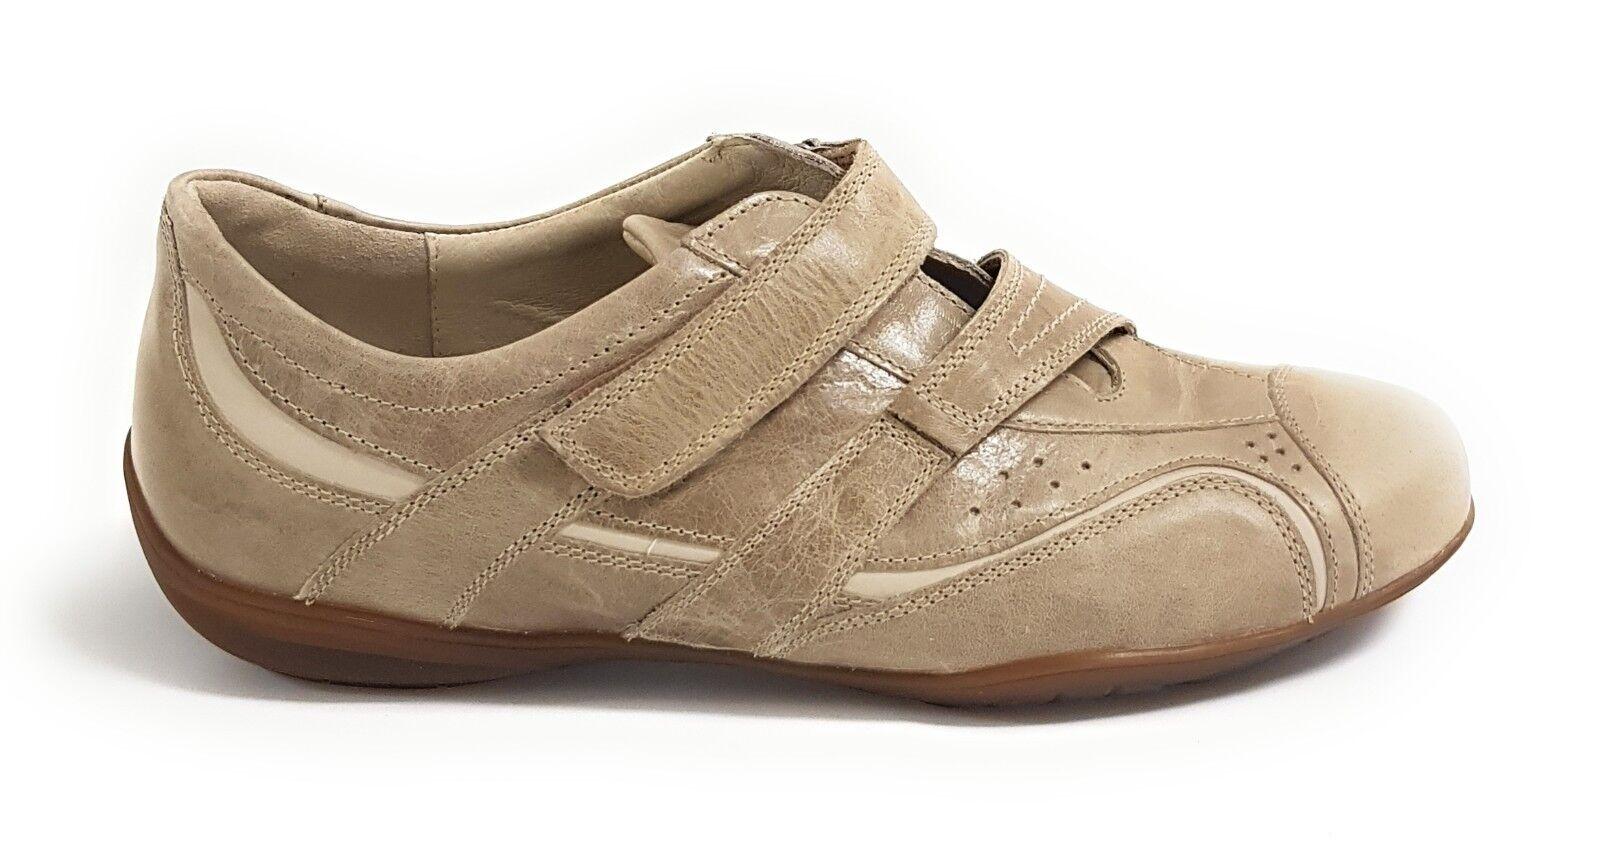 Semler Verona Damen Schuhe Sneaker Halbschuh Klettverschluss Vario-Fussbett Vario-Fussbett Vario-Fussbett b06b62